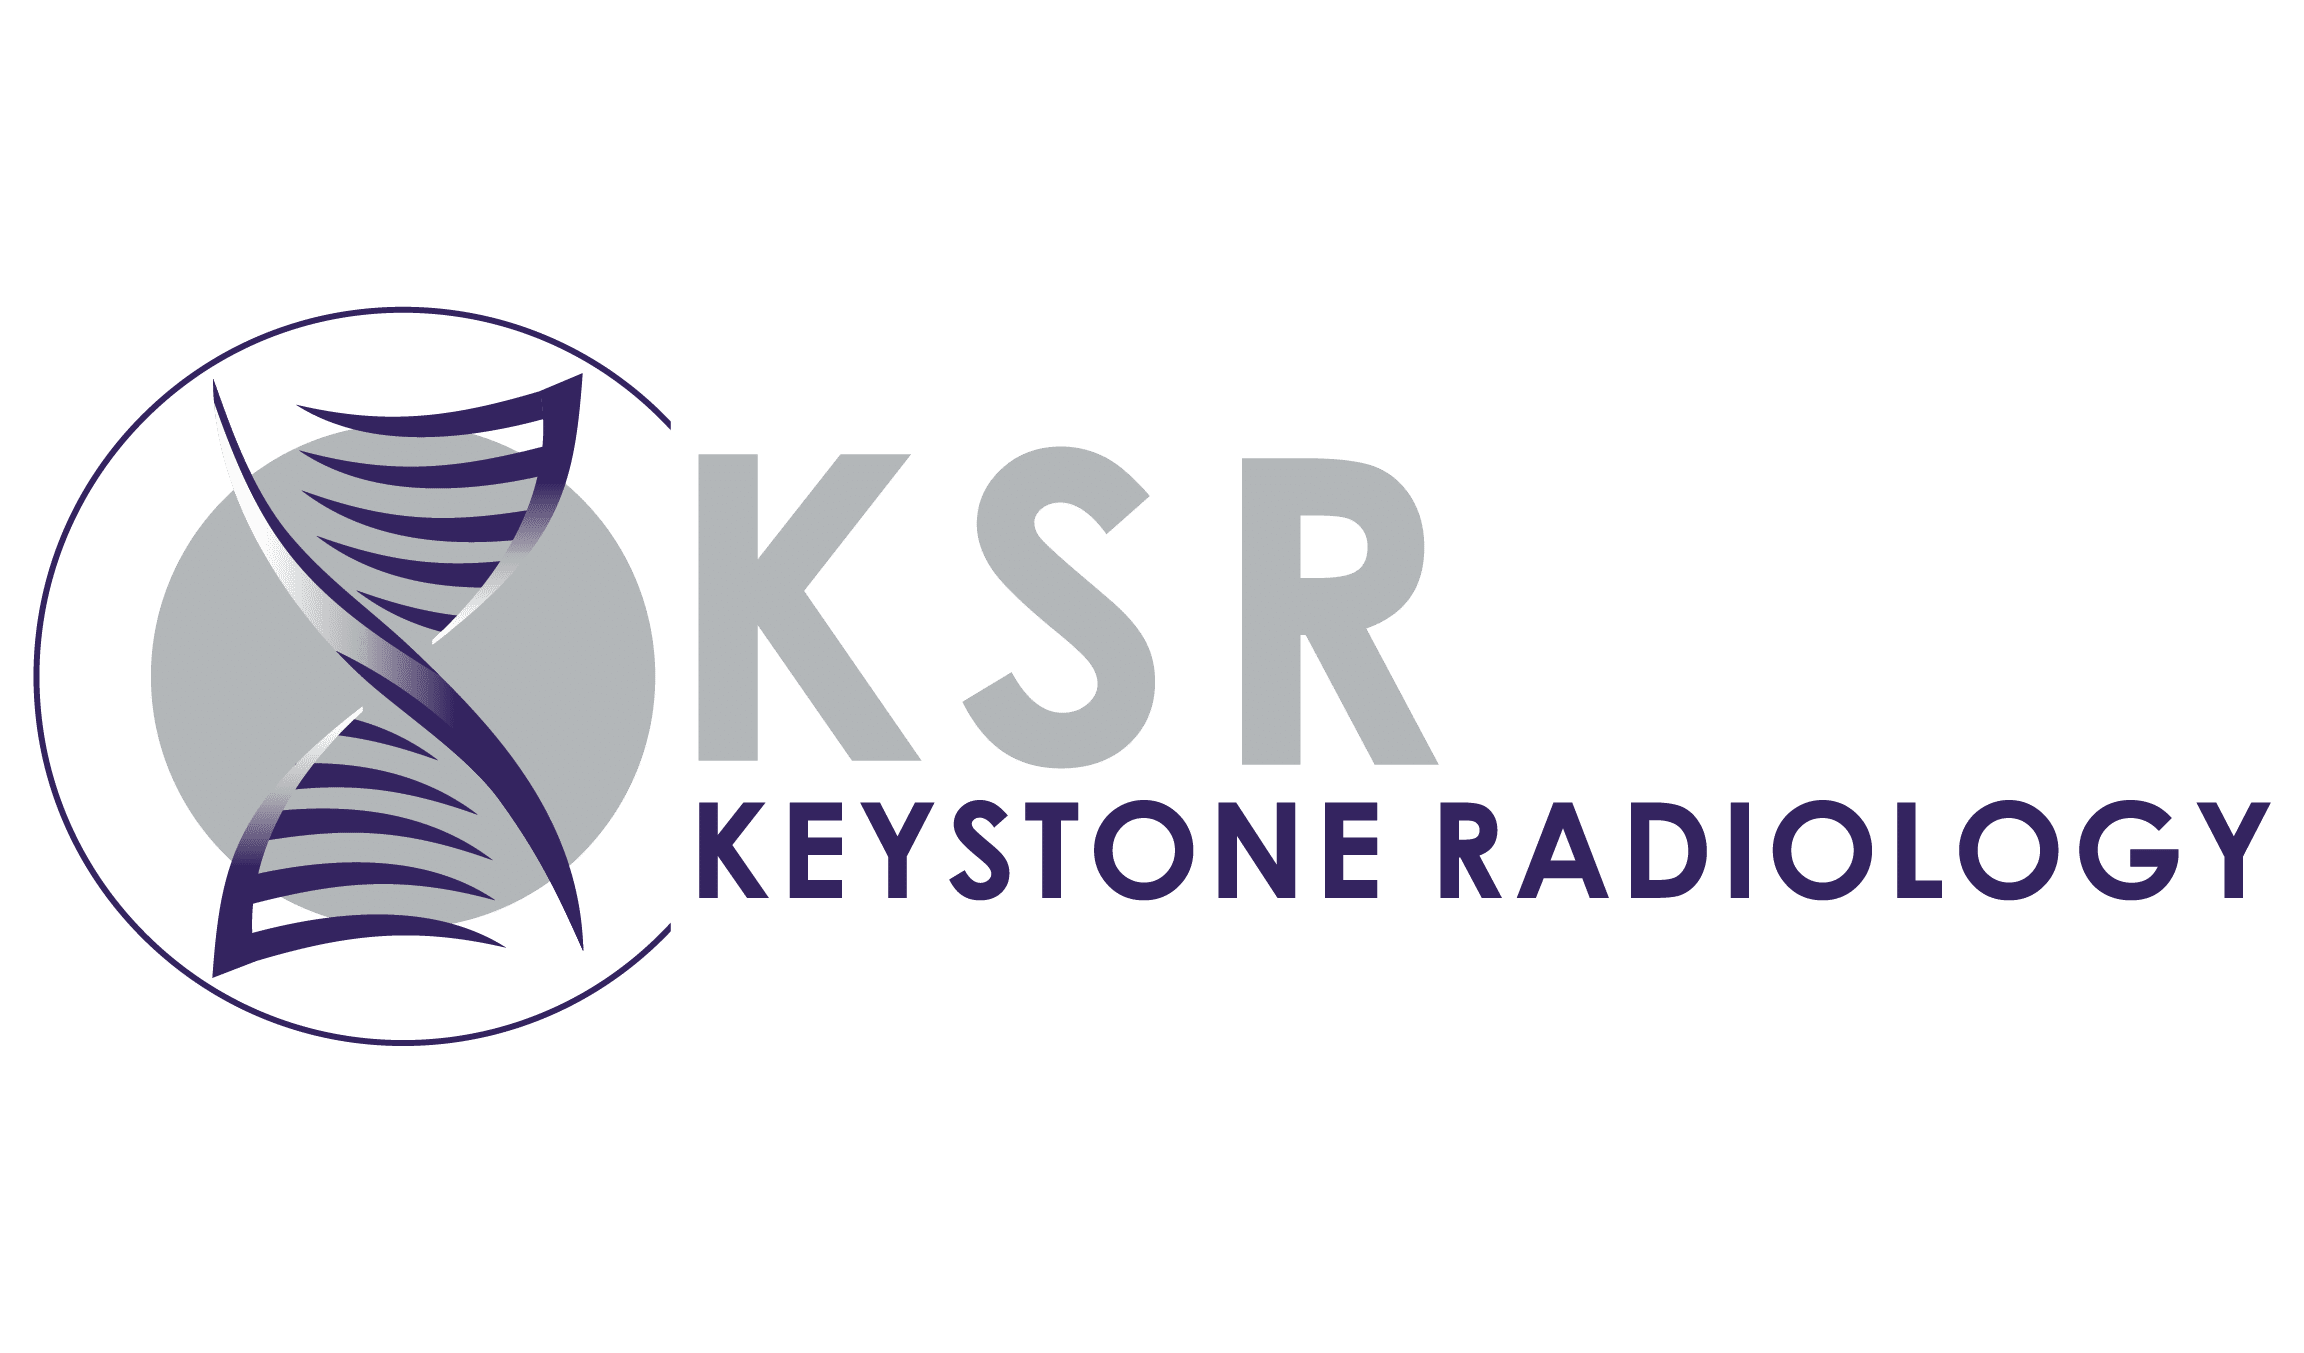 Keystone Radiology